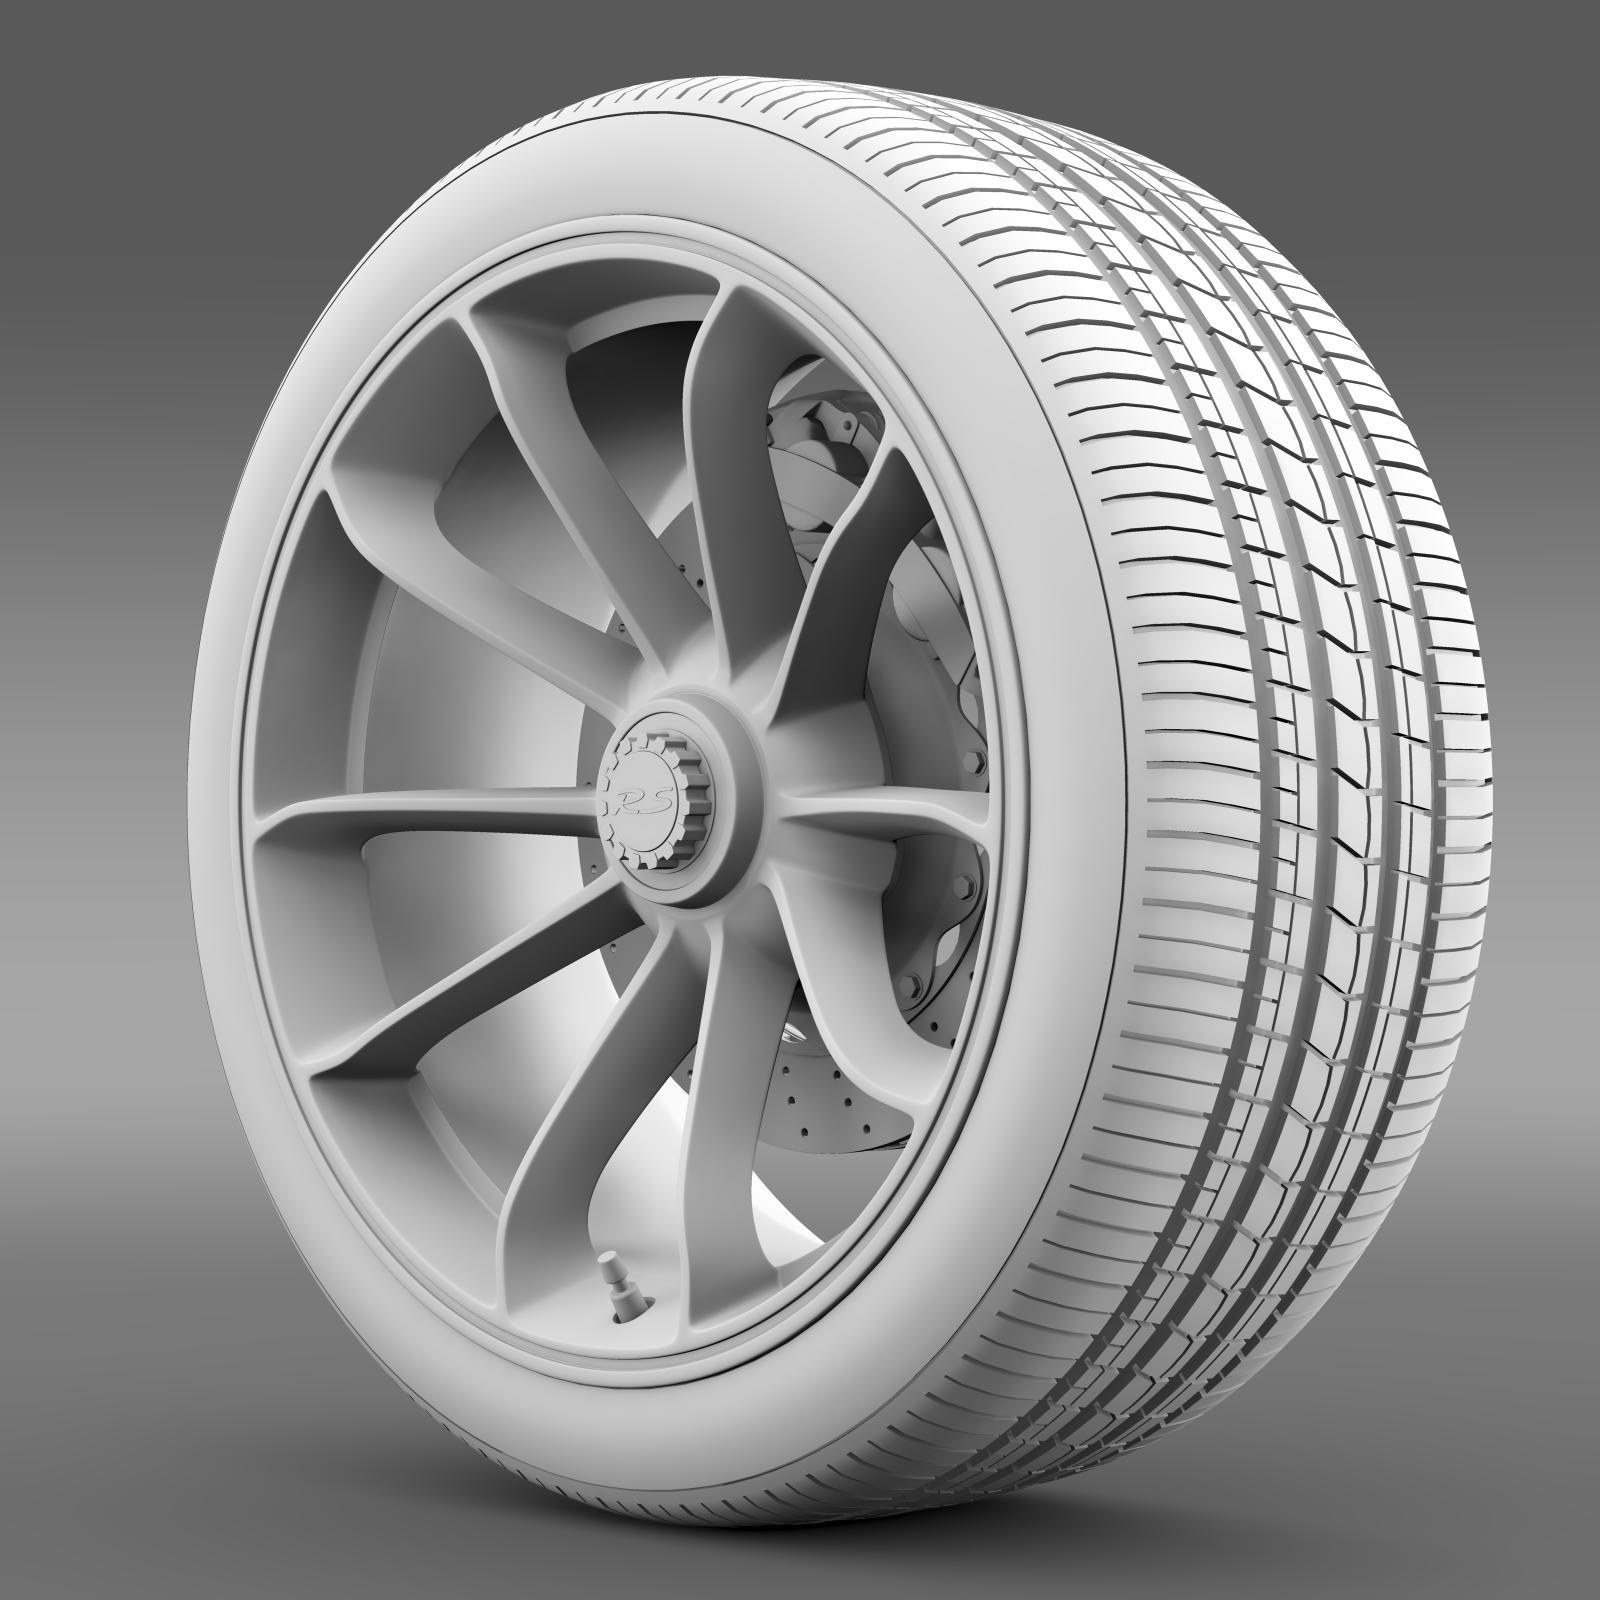 porsche 911 gt3 rs 2015 wheel 3d model 3ds max fbx c4d lwo ma mb hrc xsi obj 210836